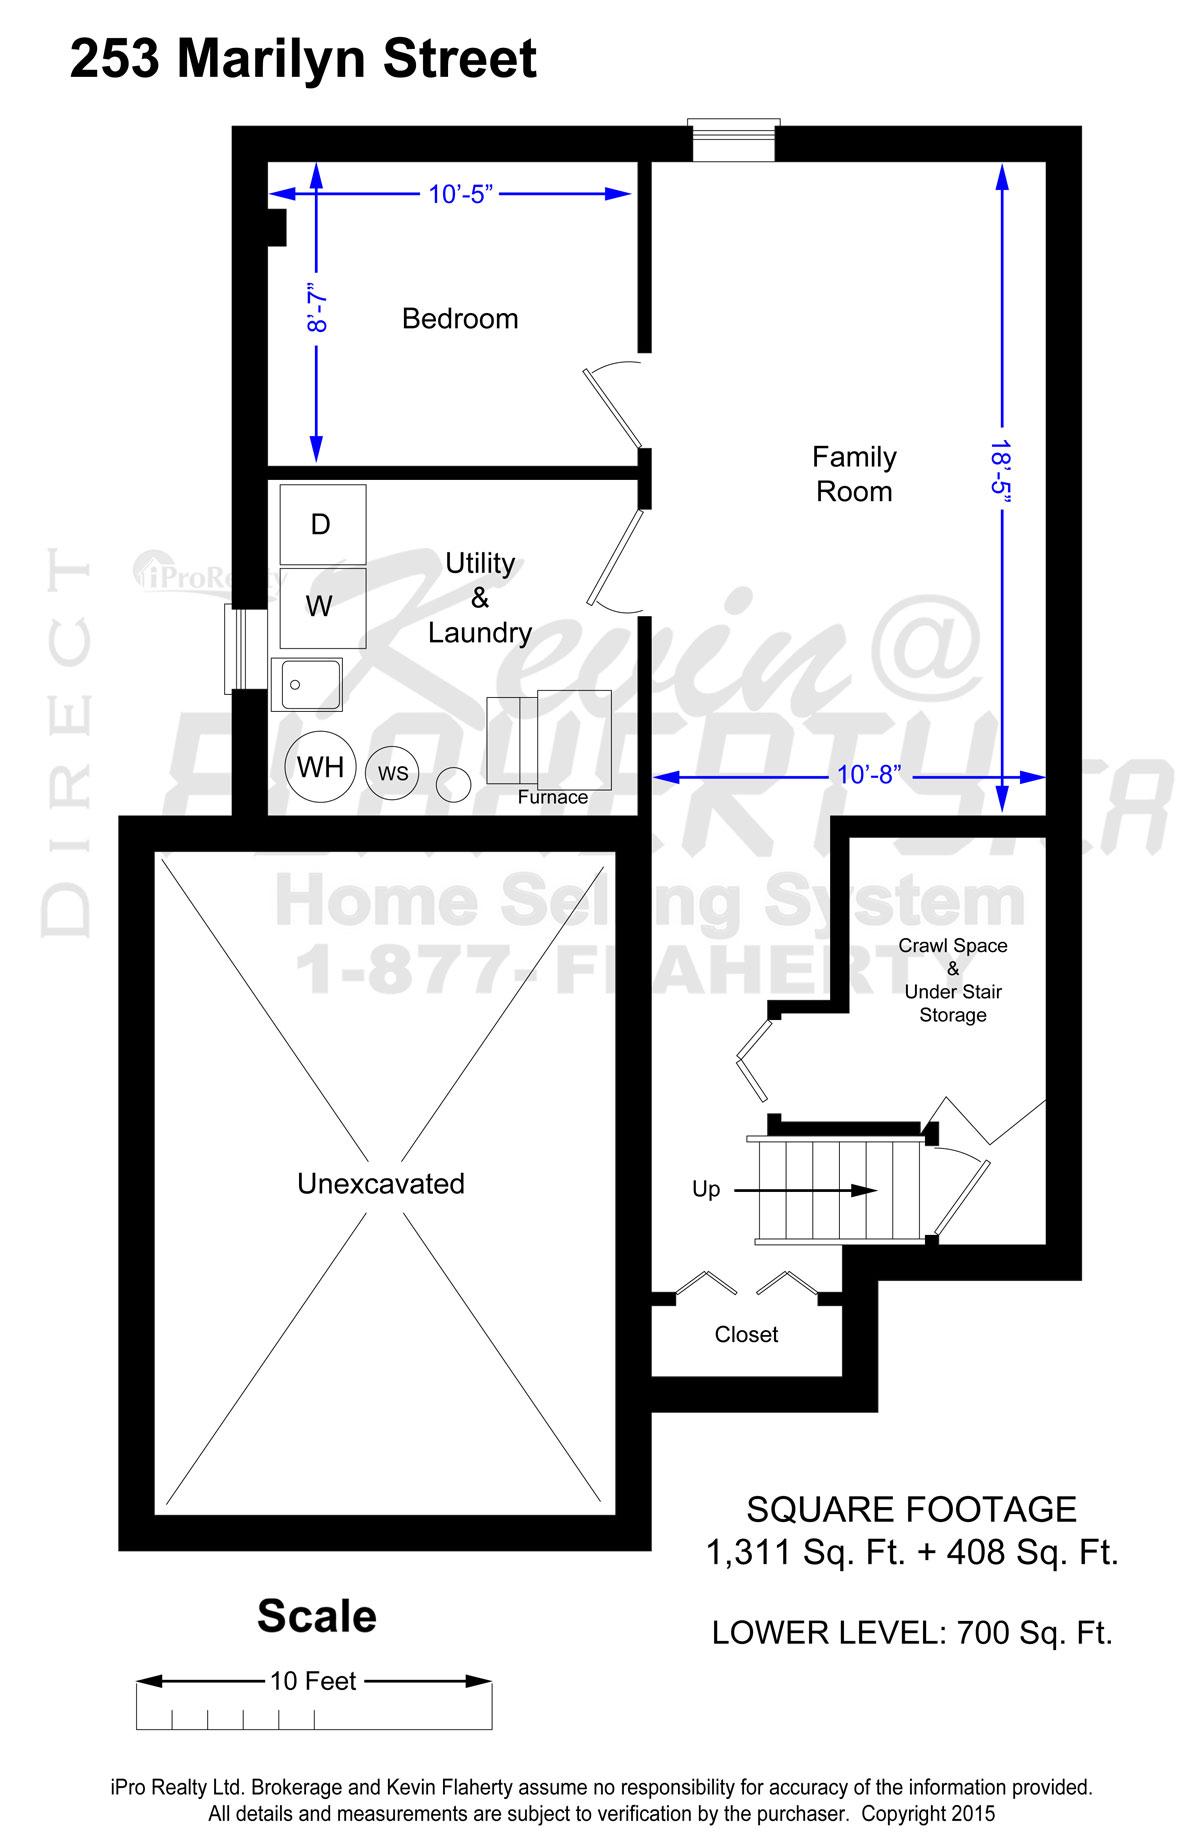 253 Marilyn Shelburne Real Estate Listing